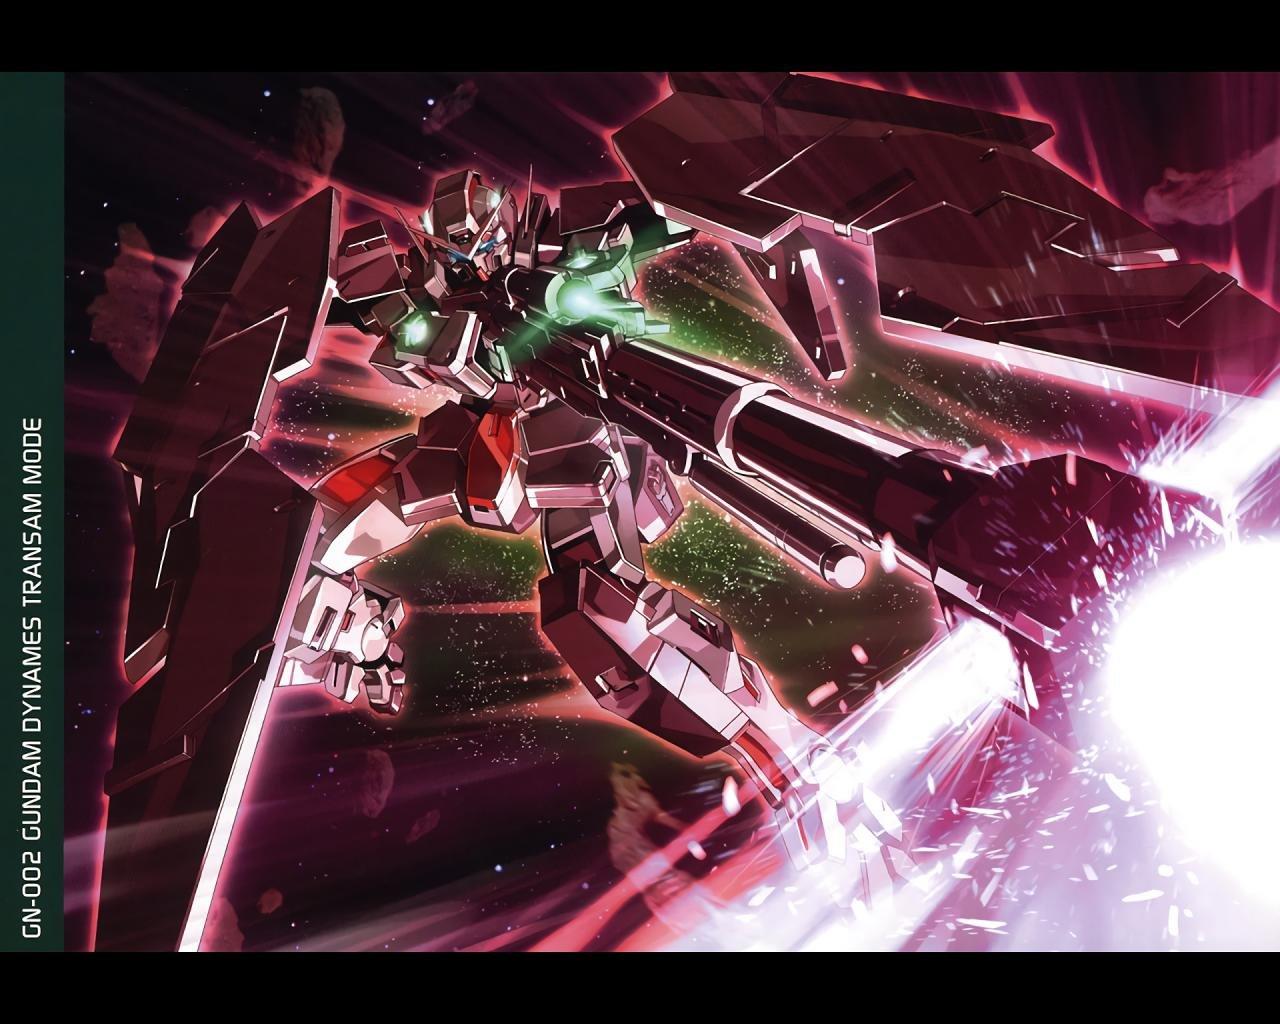 Mobile Suit Gundam 00 Wallpapers 1280x1024 Desktop Backgrounds